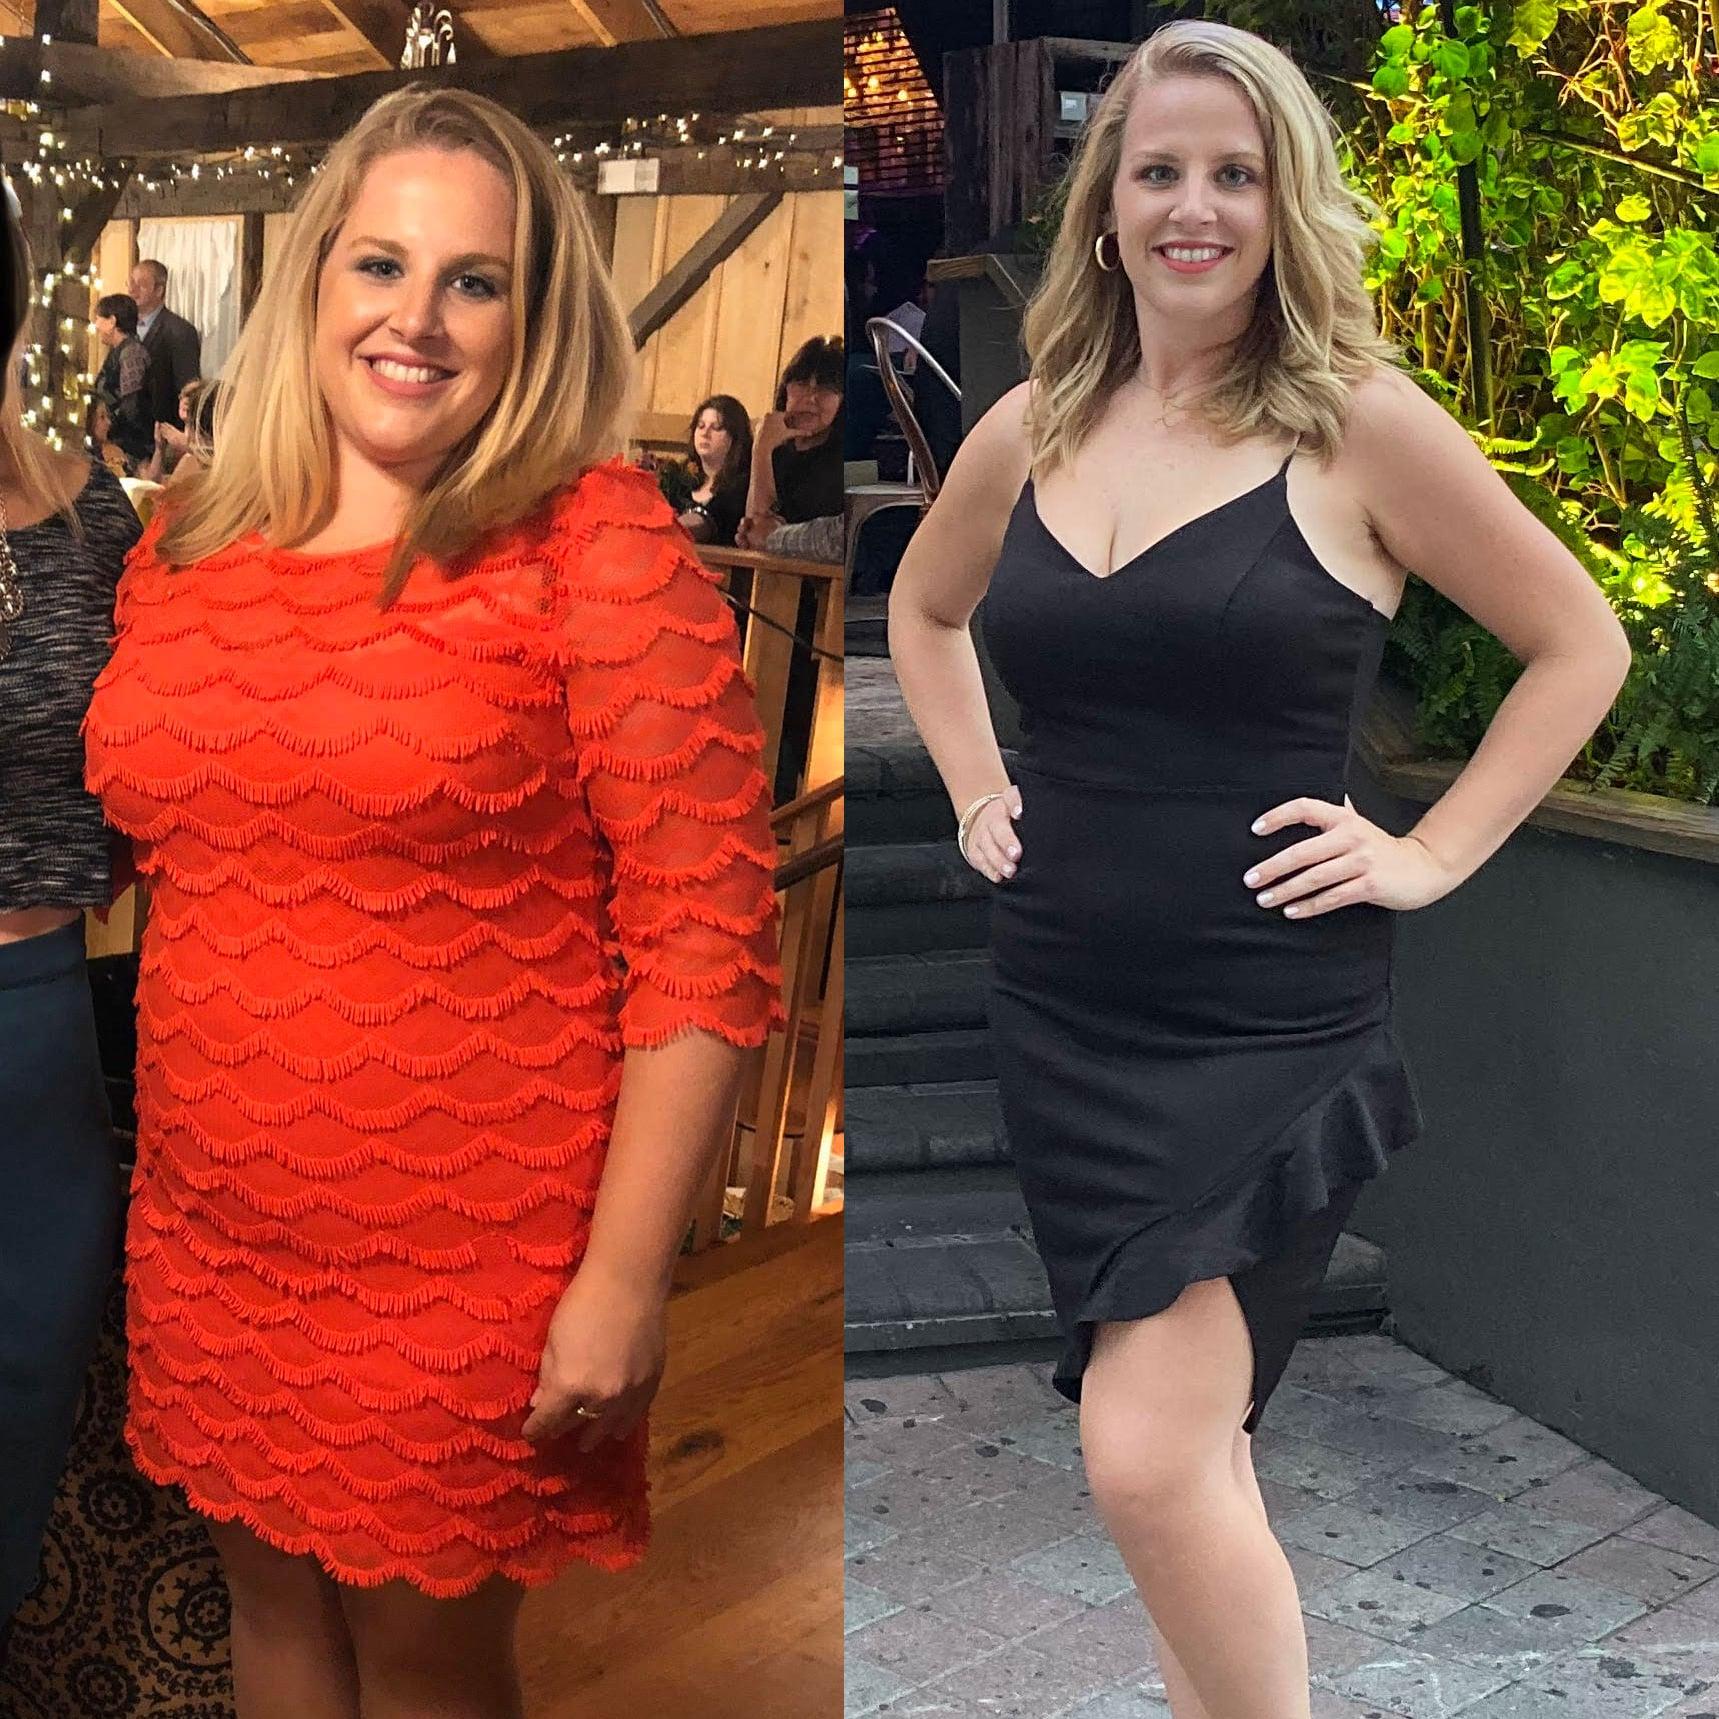 85 Pound Intermittent Fasting Weight Loss Transformation Popsugar Fitness